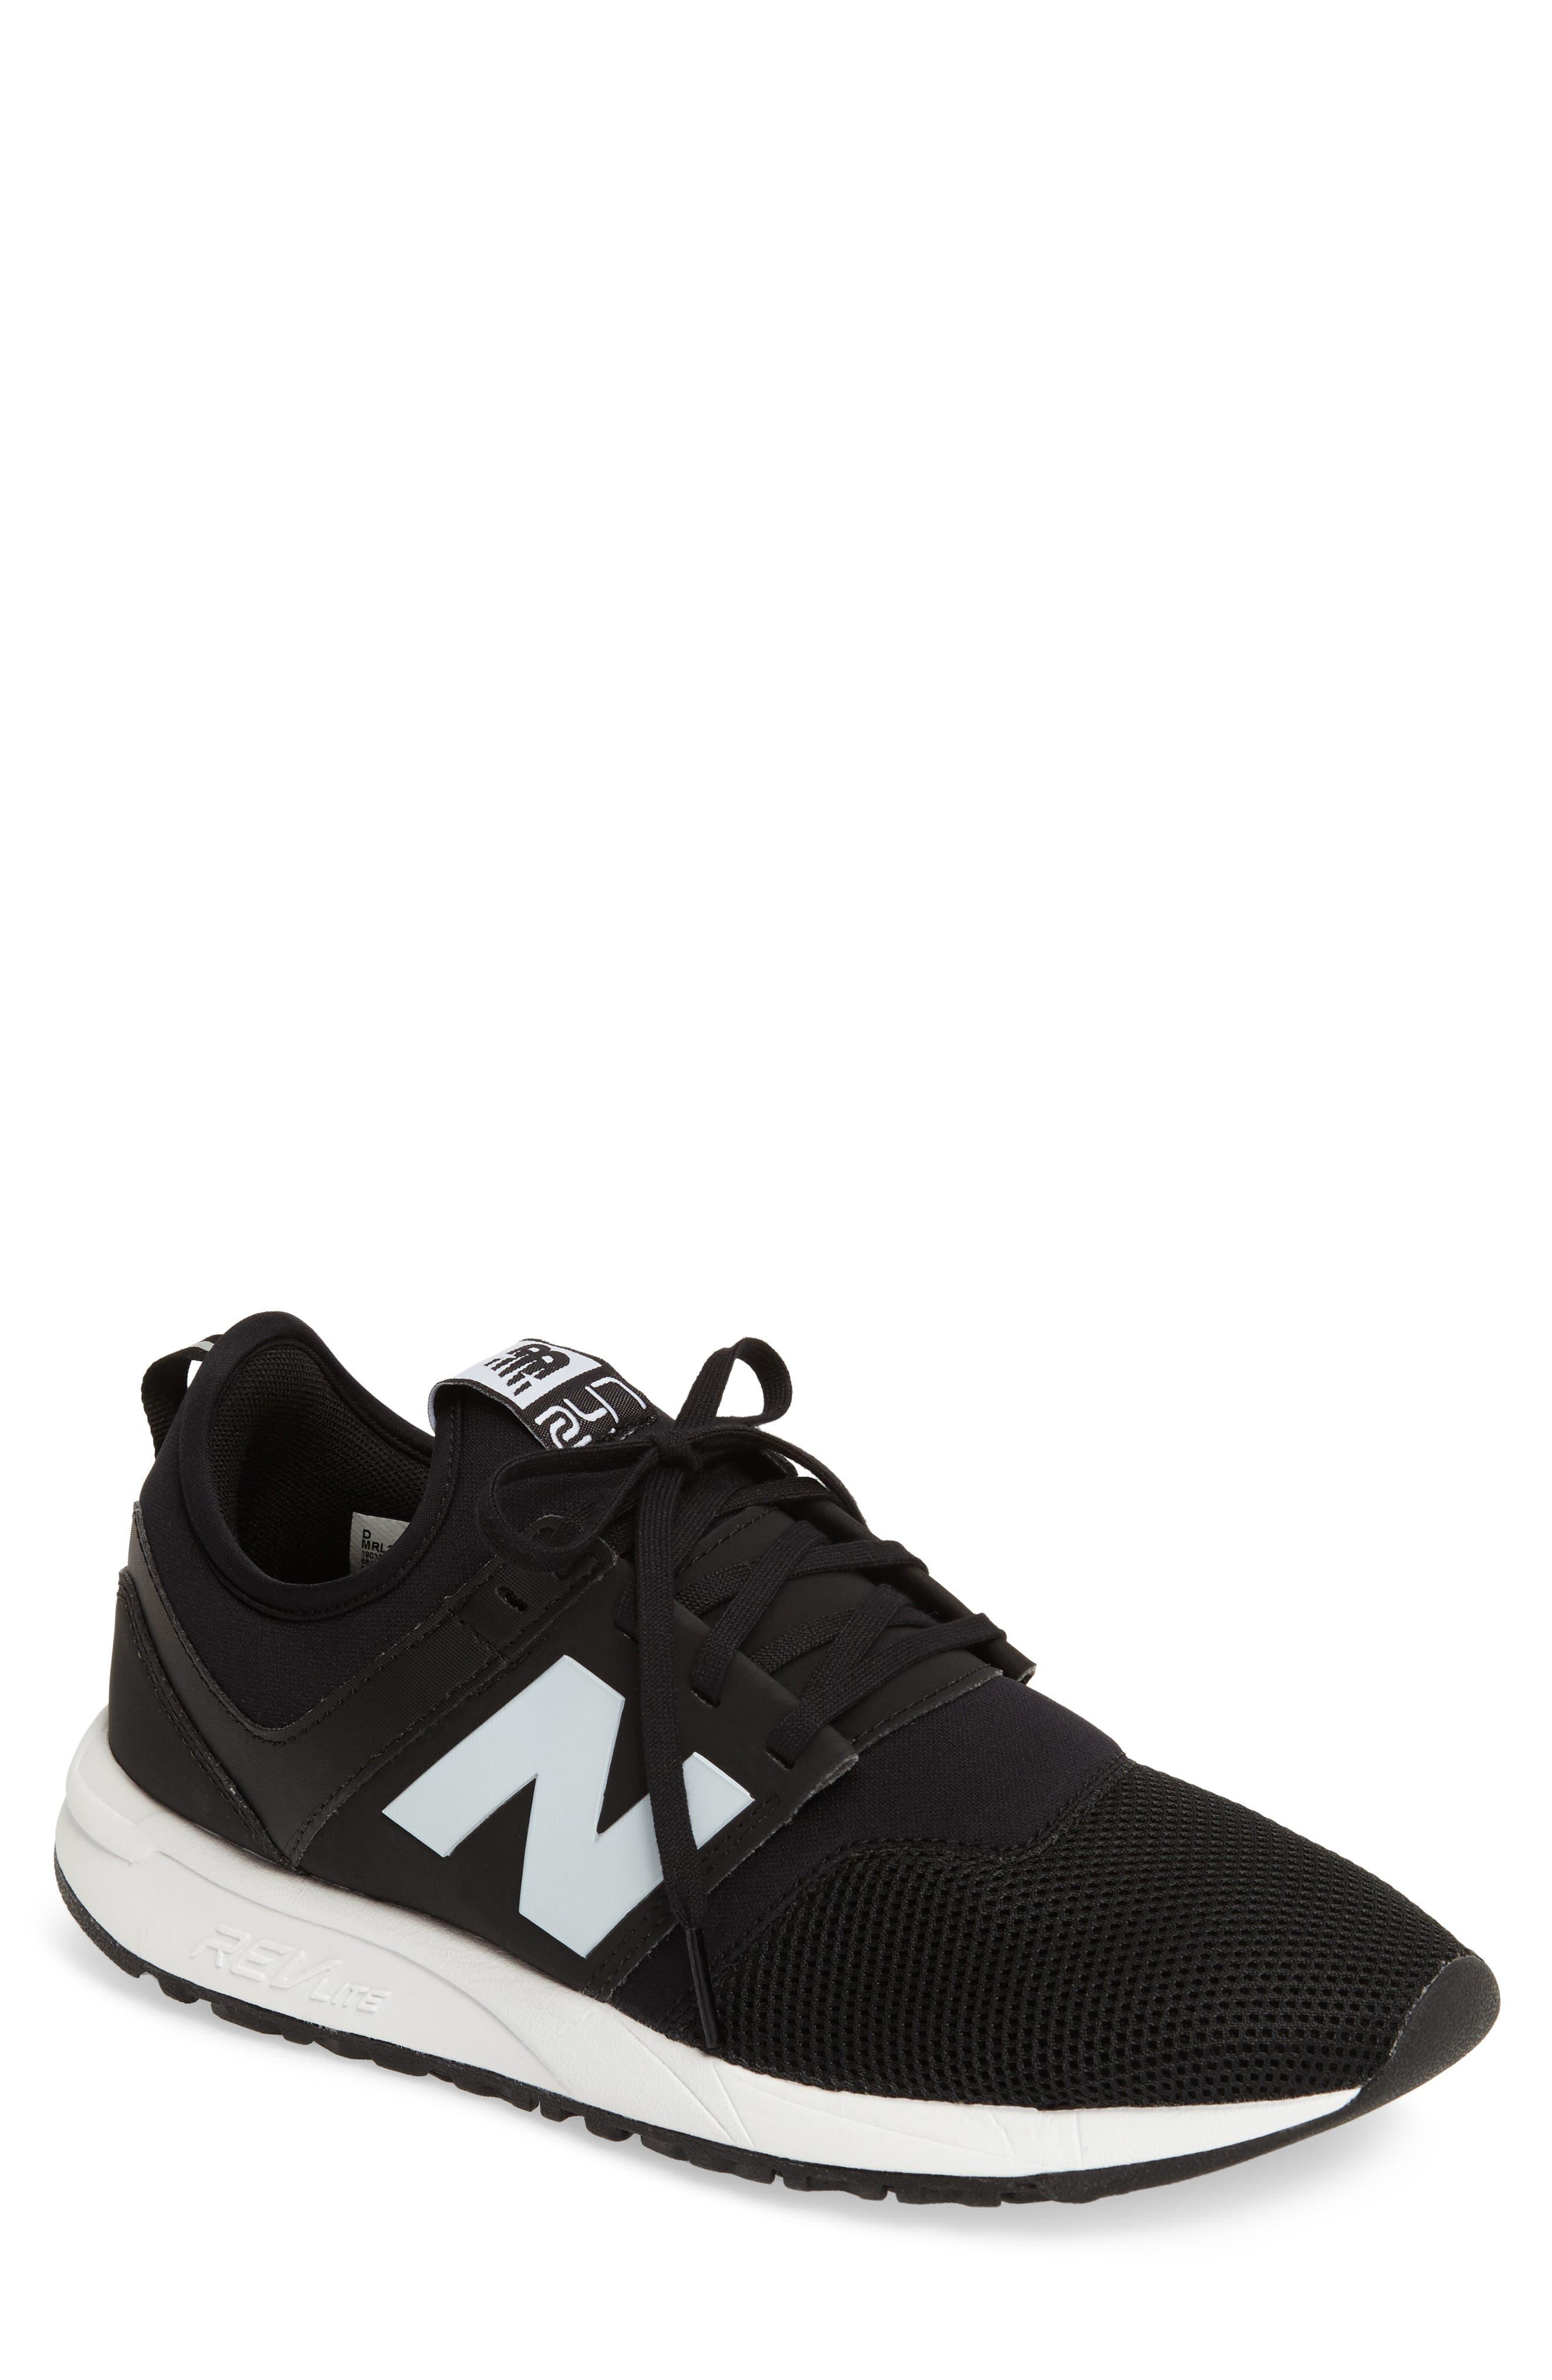 247 Modern Classic Sneaker,                         Main,                         color, 001